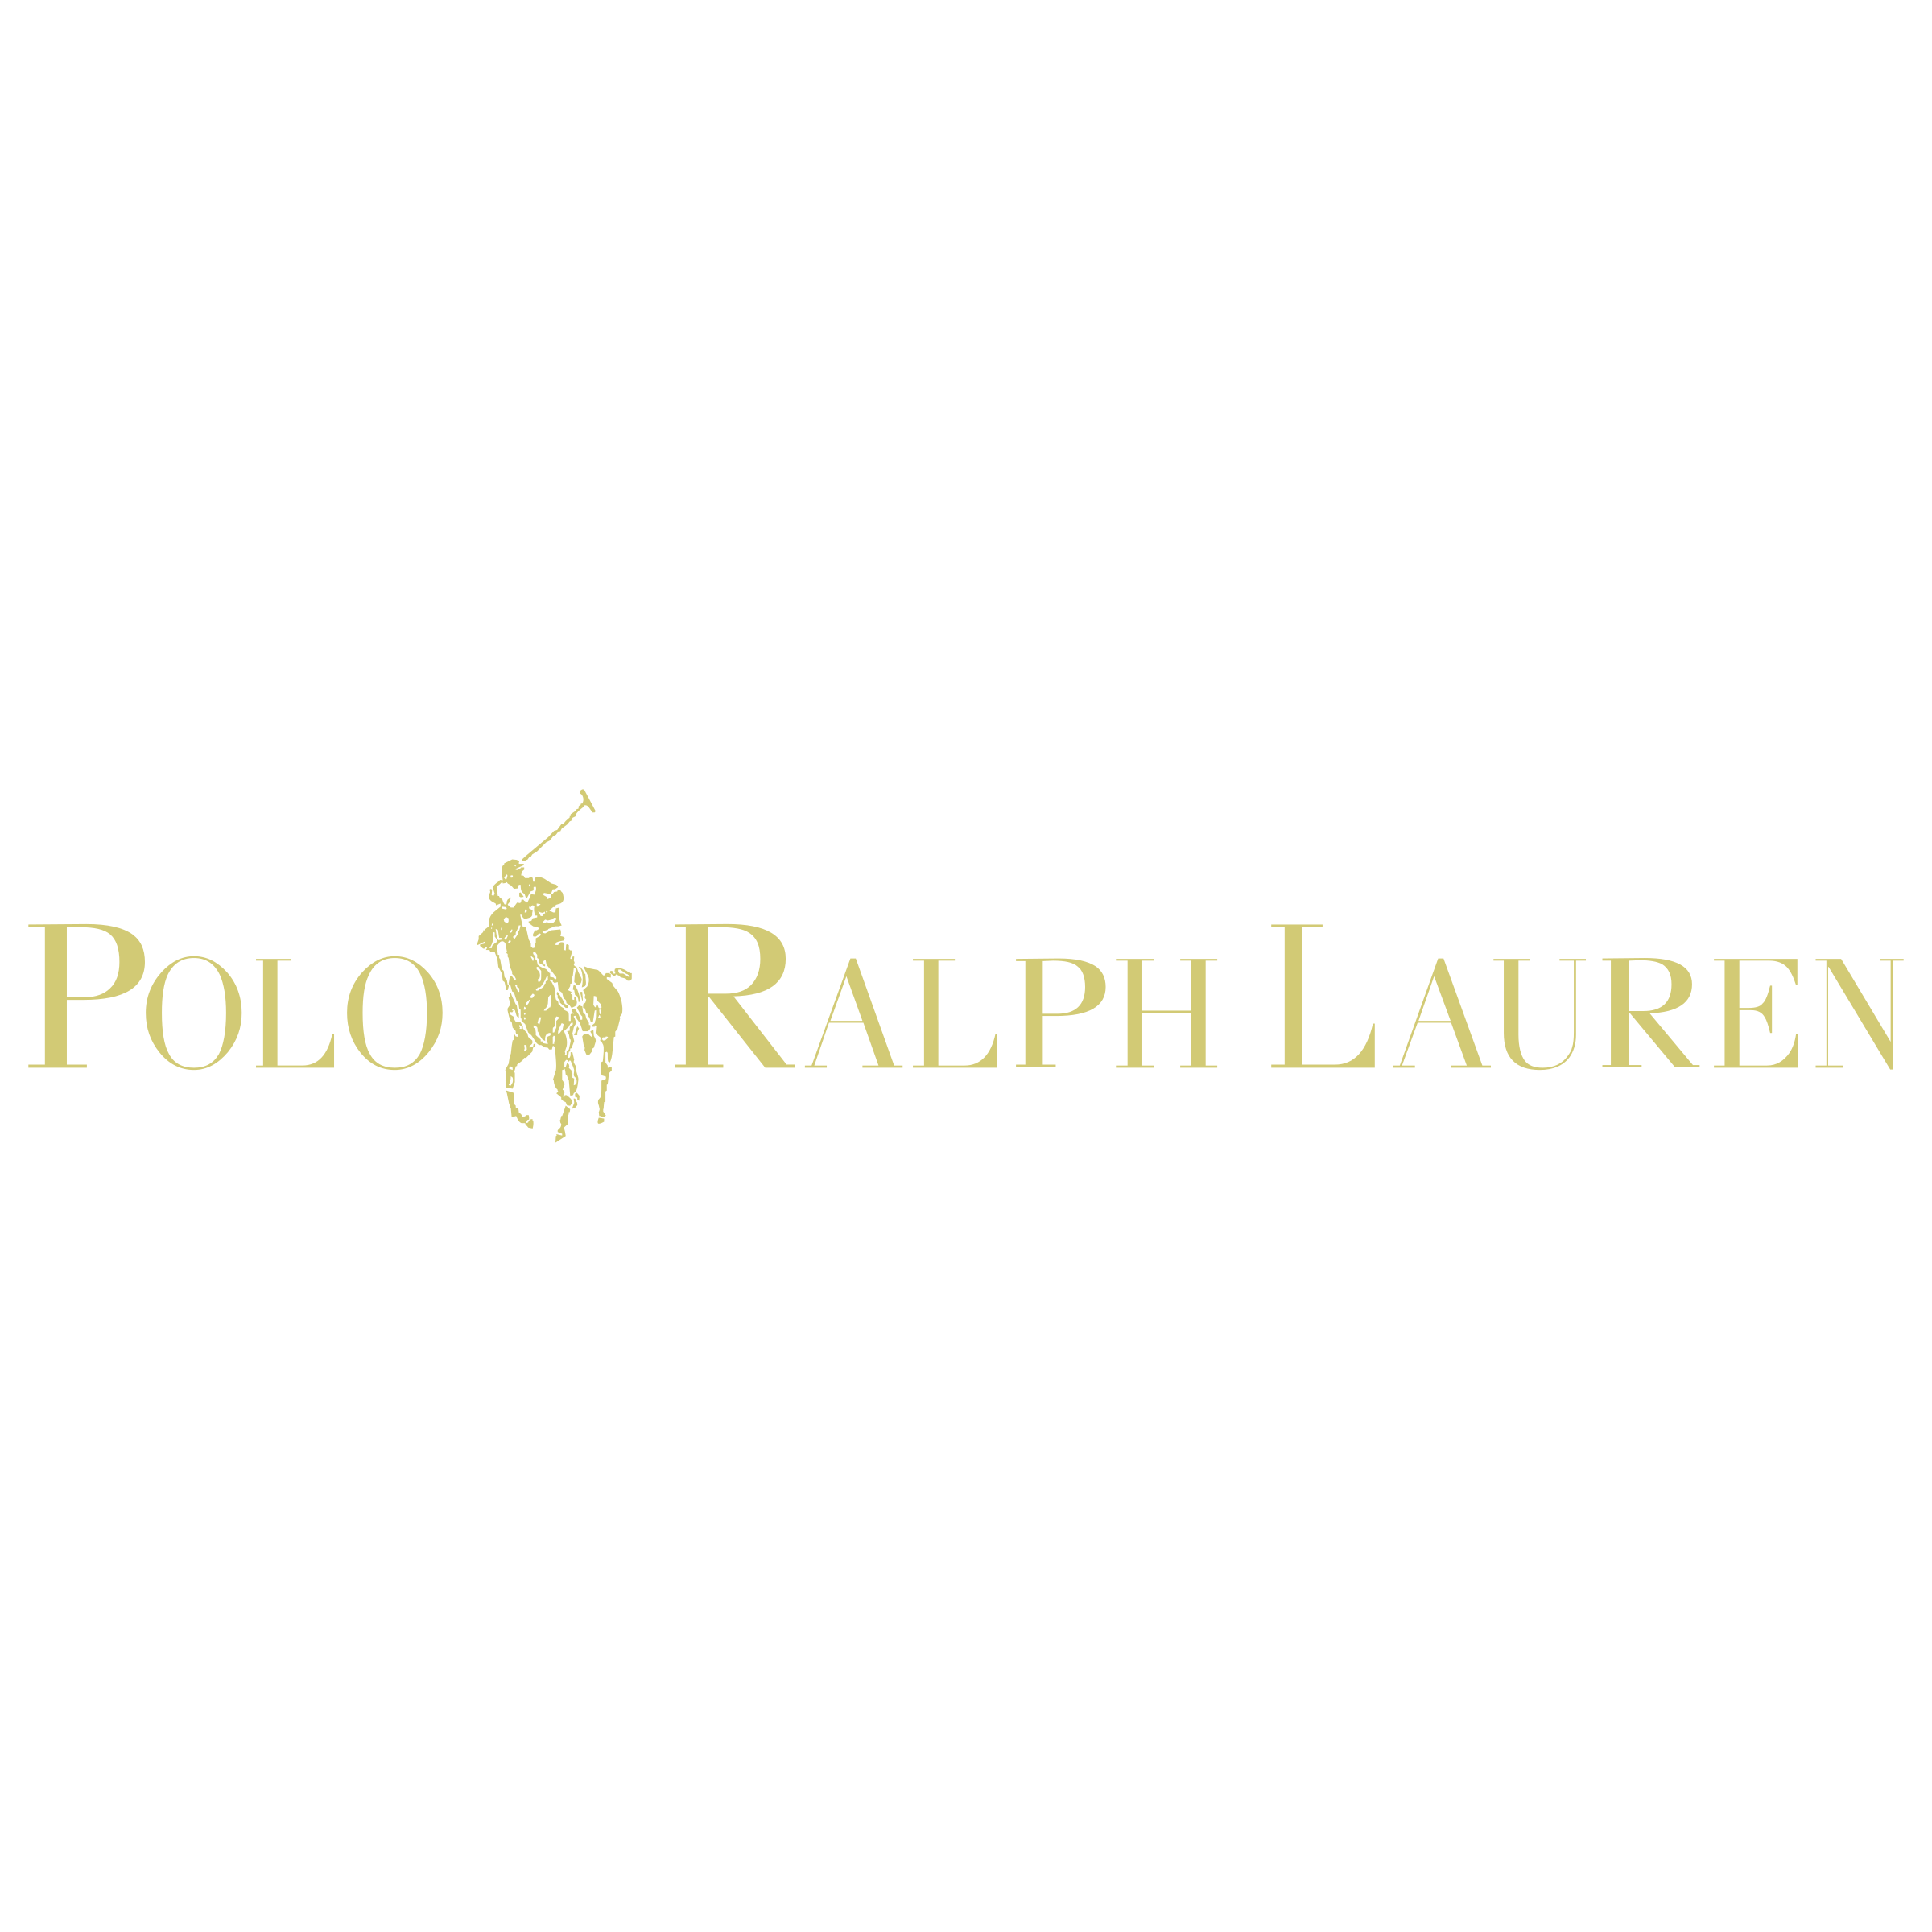 new concept 2df1d ea55d Polo Ralph Lauren Logo PNG Transparent & SVG Vector ...